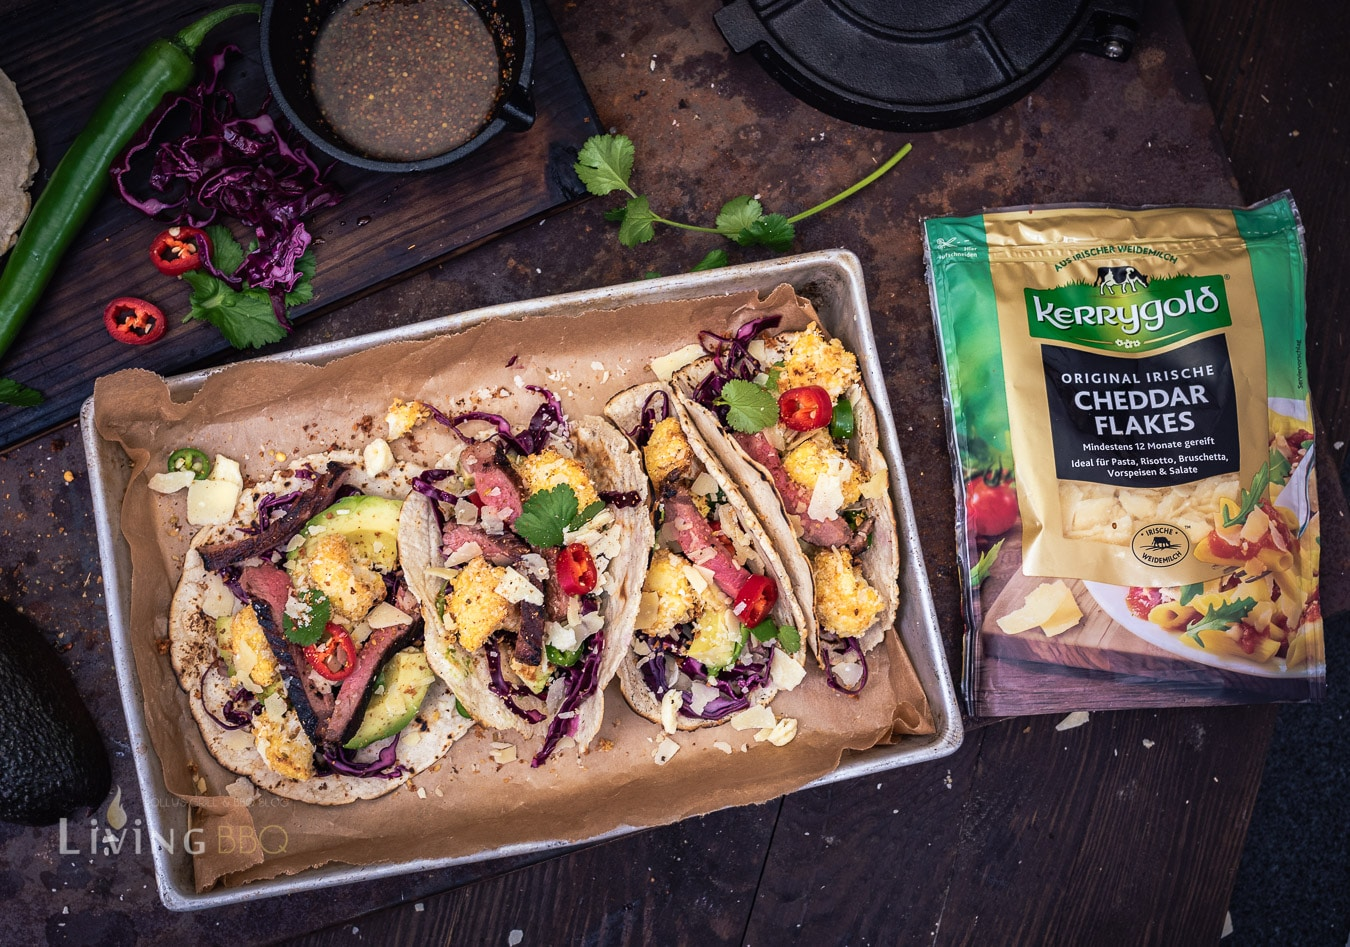 Tacos mit Cheddar Flakes